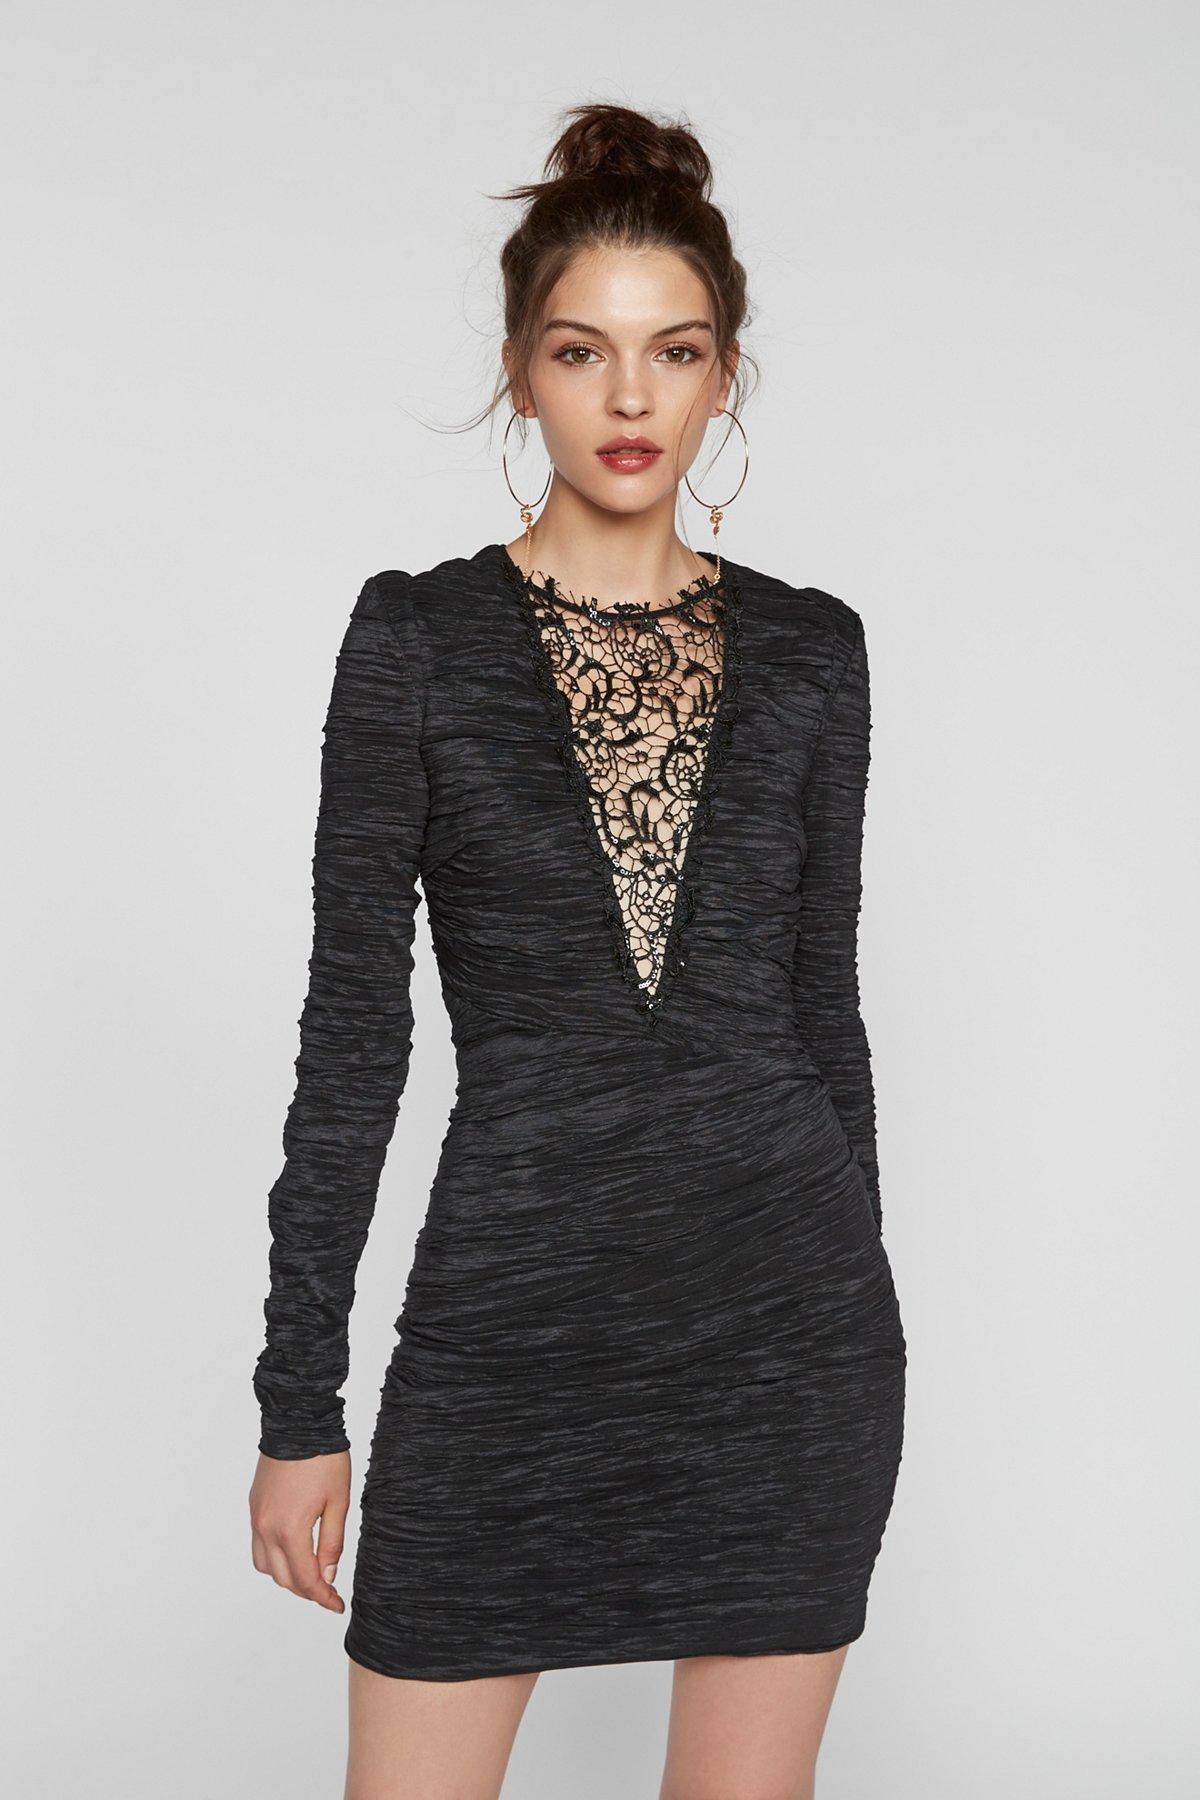 Look of Love Bodycon Dress